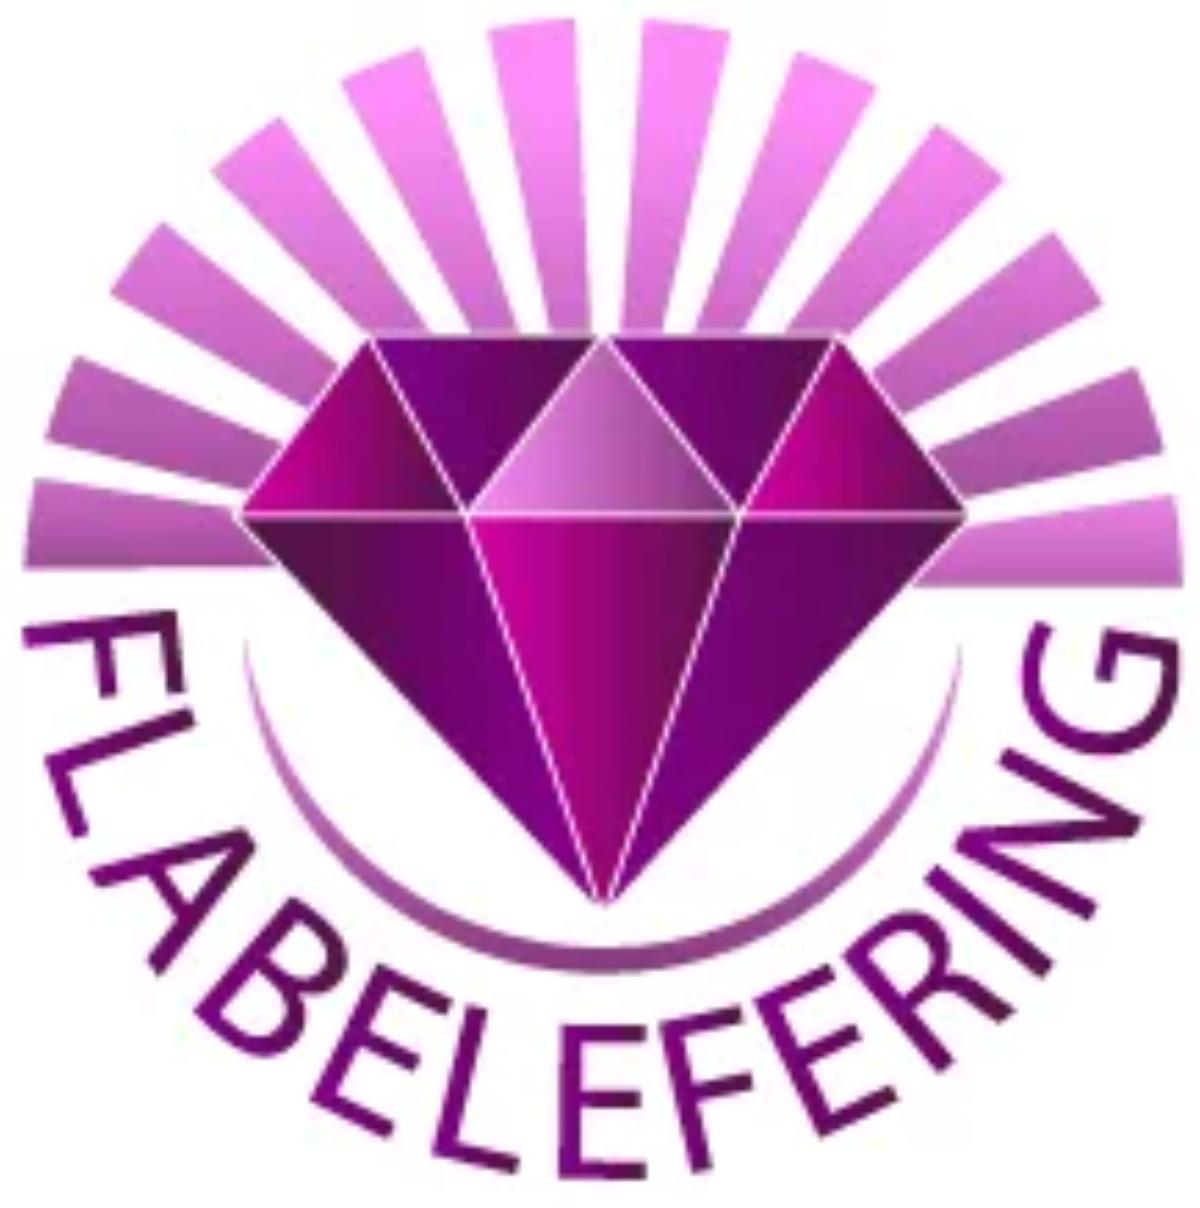 Уникальная коучинг-программа По системе флабелеферинга